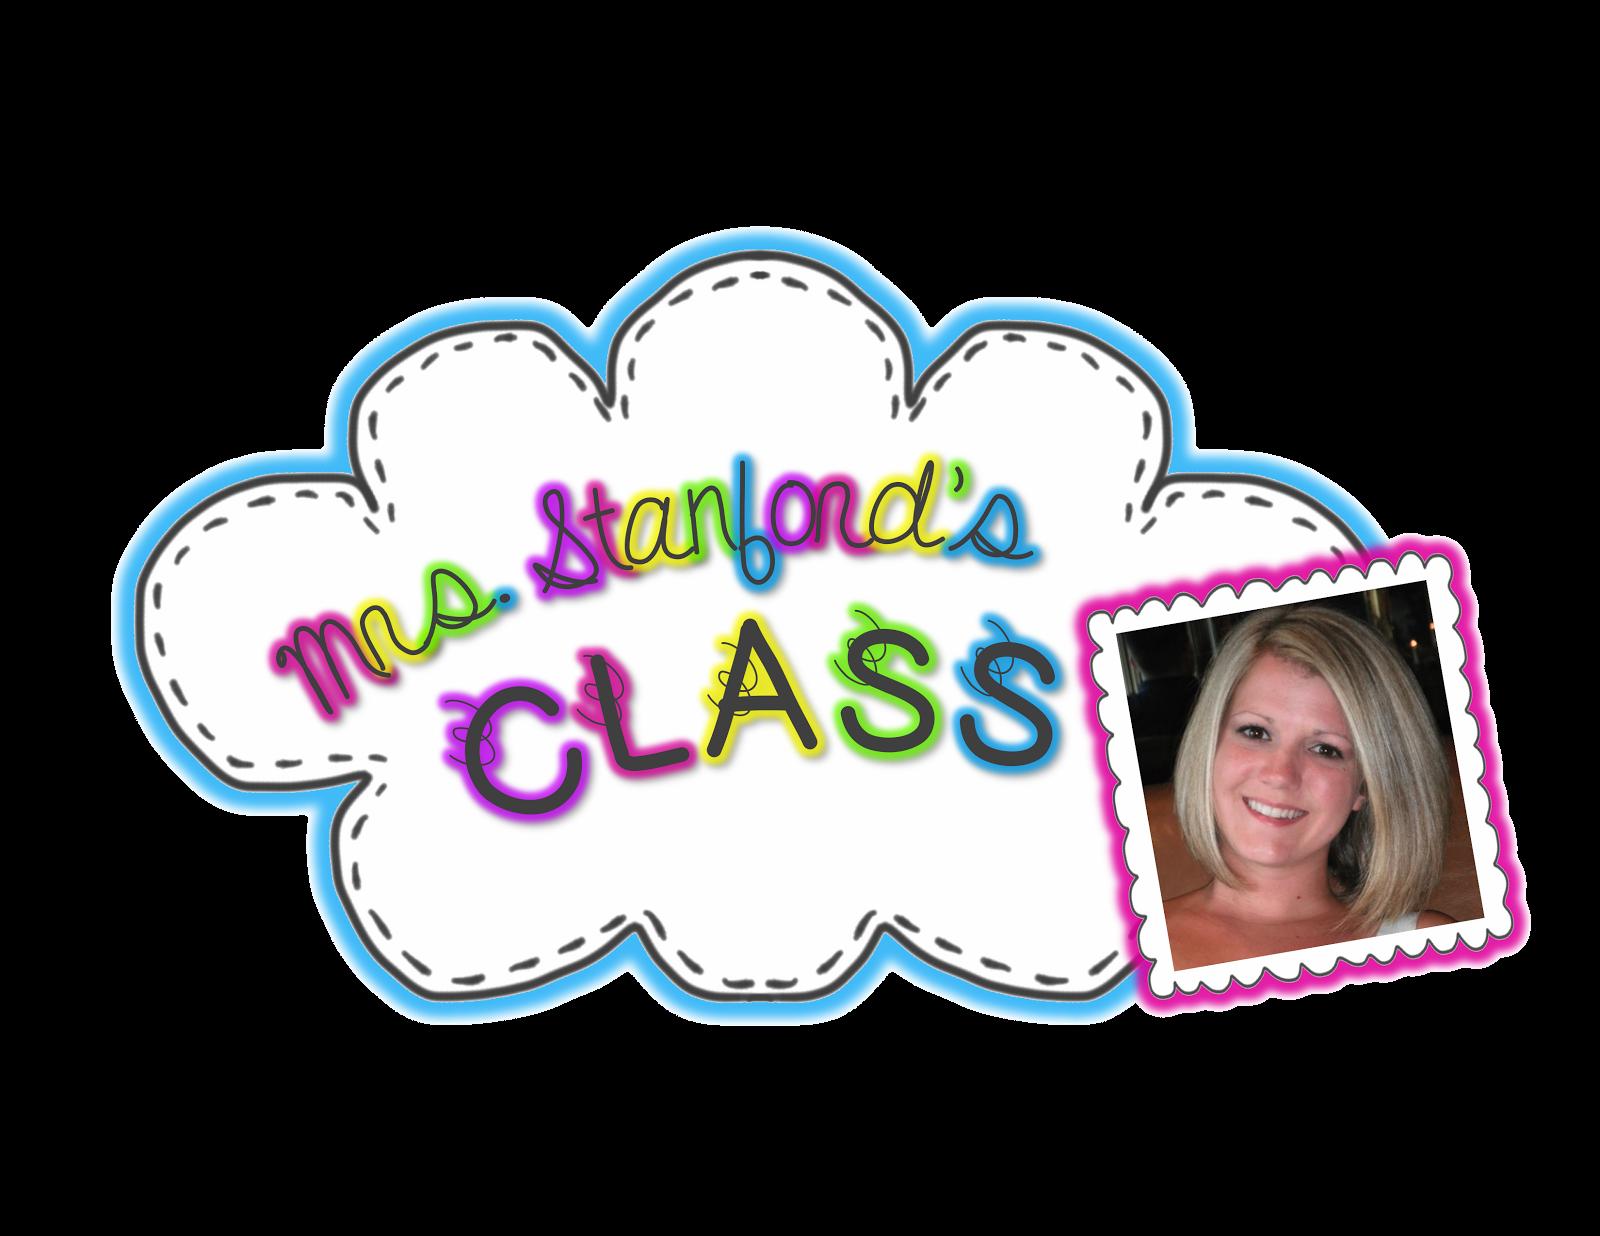 MrsStanfordsClass